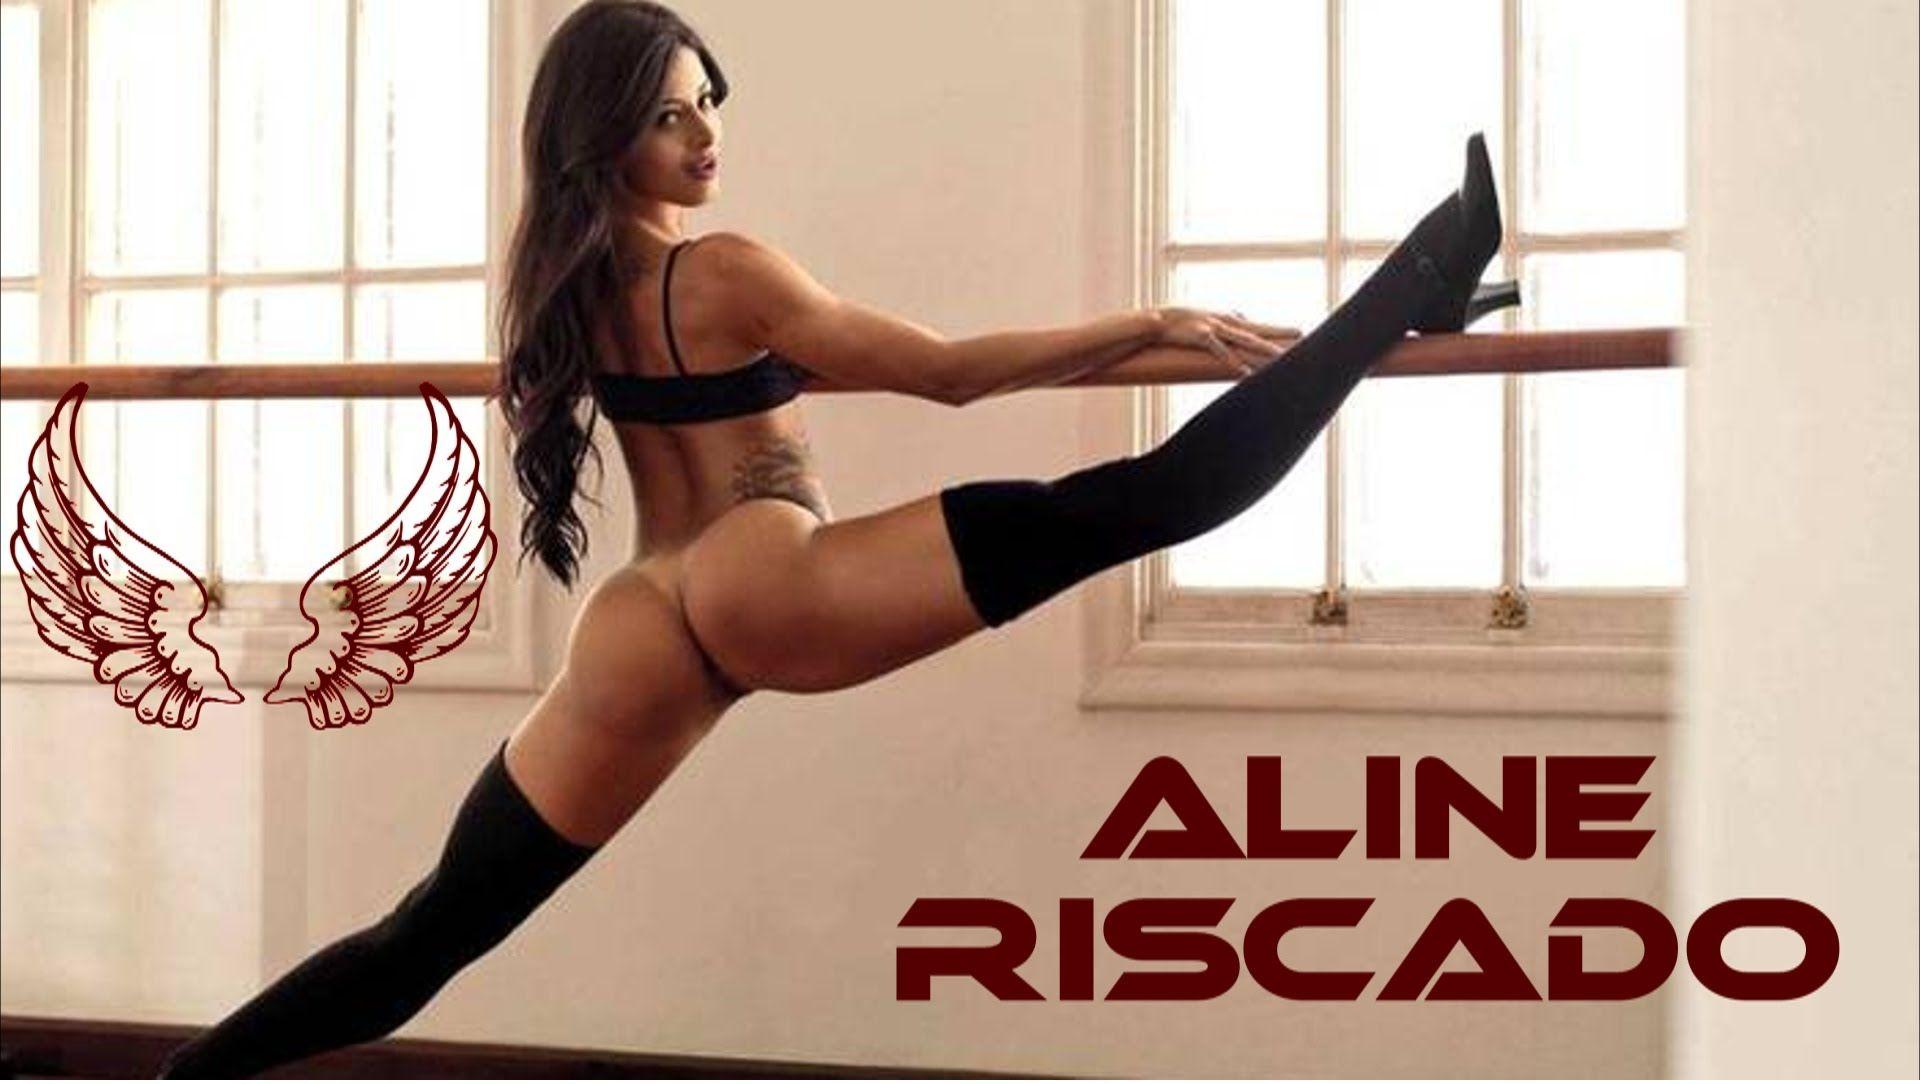 Aline Riscado Playboy aline riscado   aline riscado, aline riscado playboy e fotos